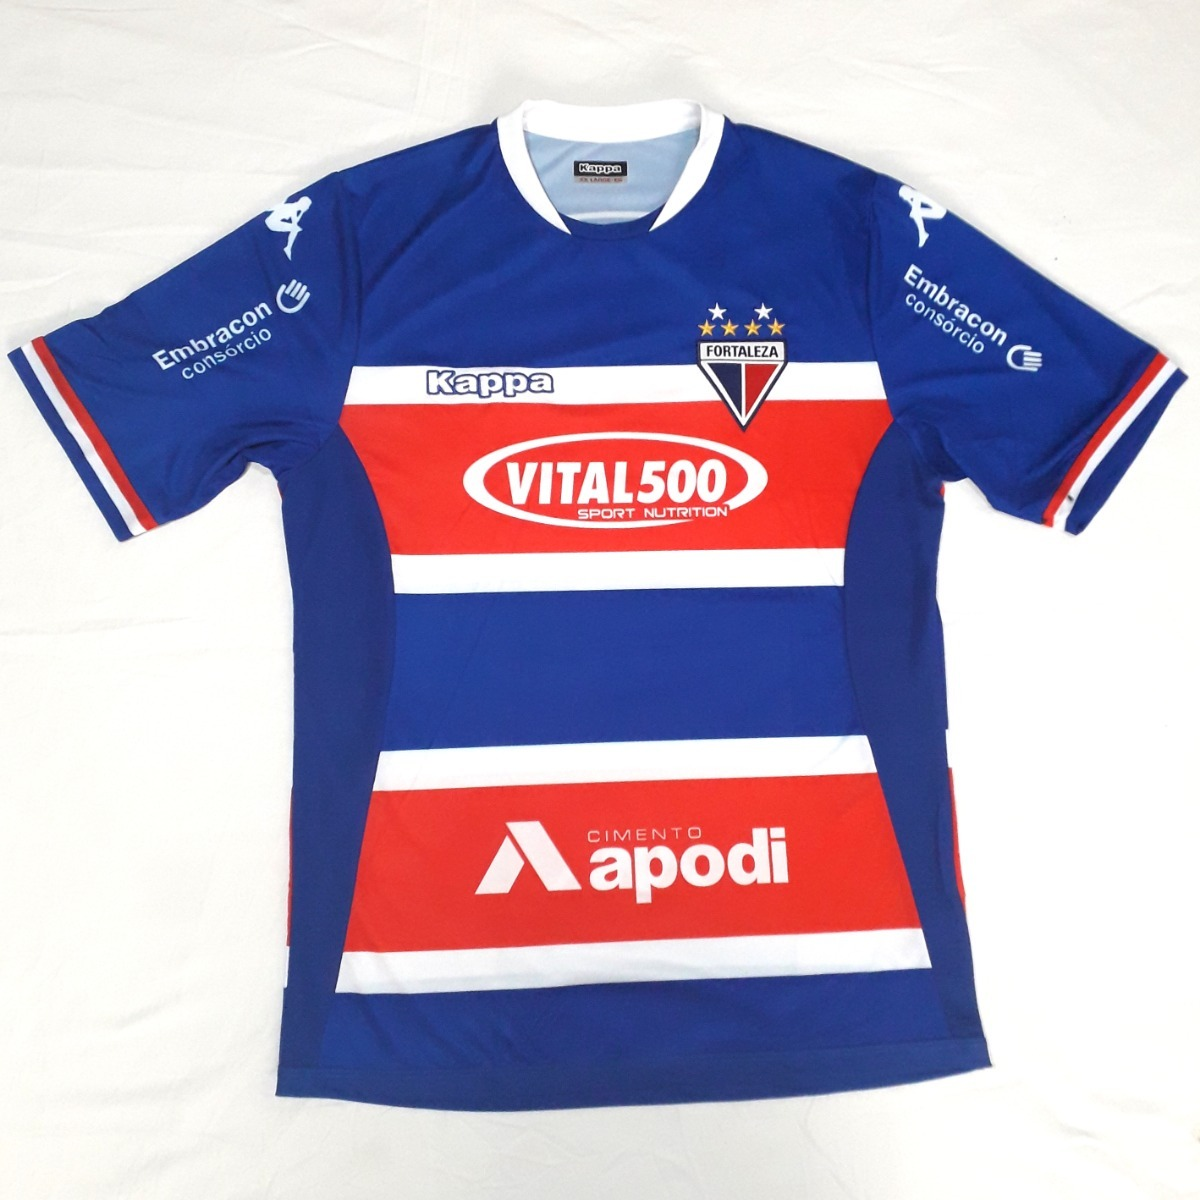 b84689f5b9b01 Camisa Do Fortaleza Kappa Tricolor Original Nova - R  120